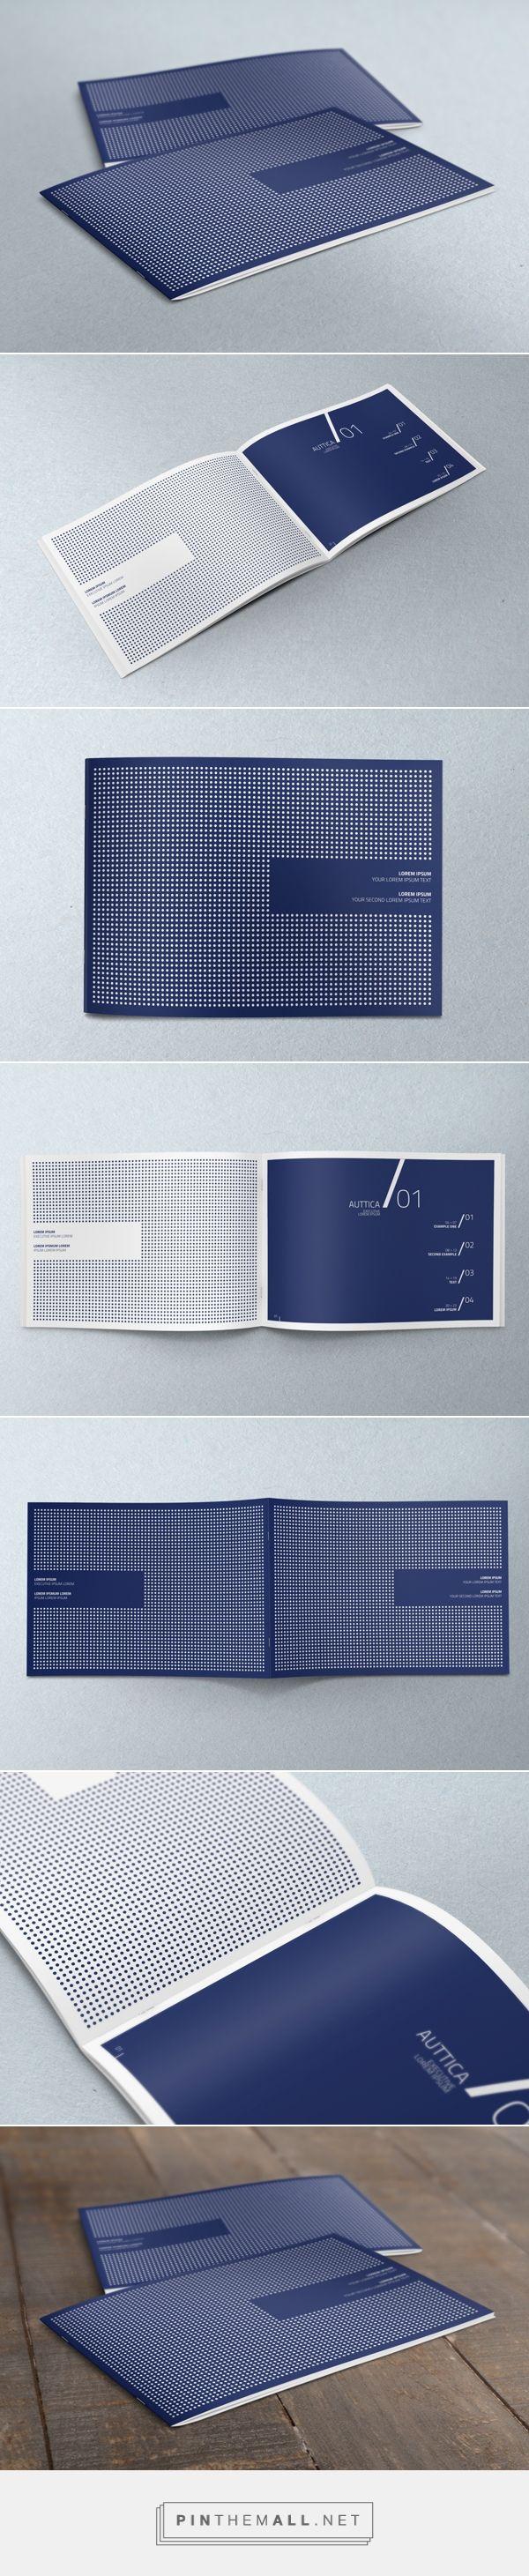 Horizontal A4 Brochure Mock-up by yogurt86 design studio